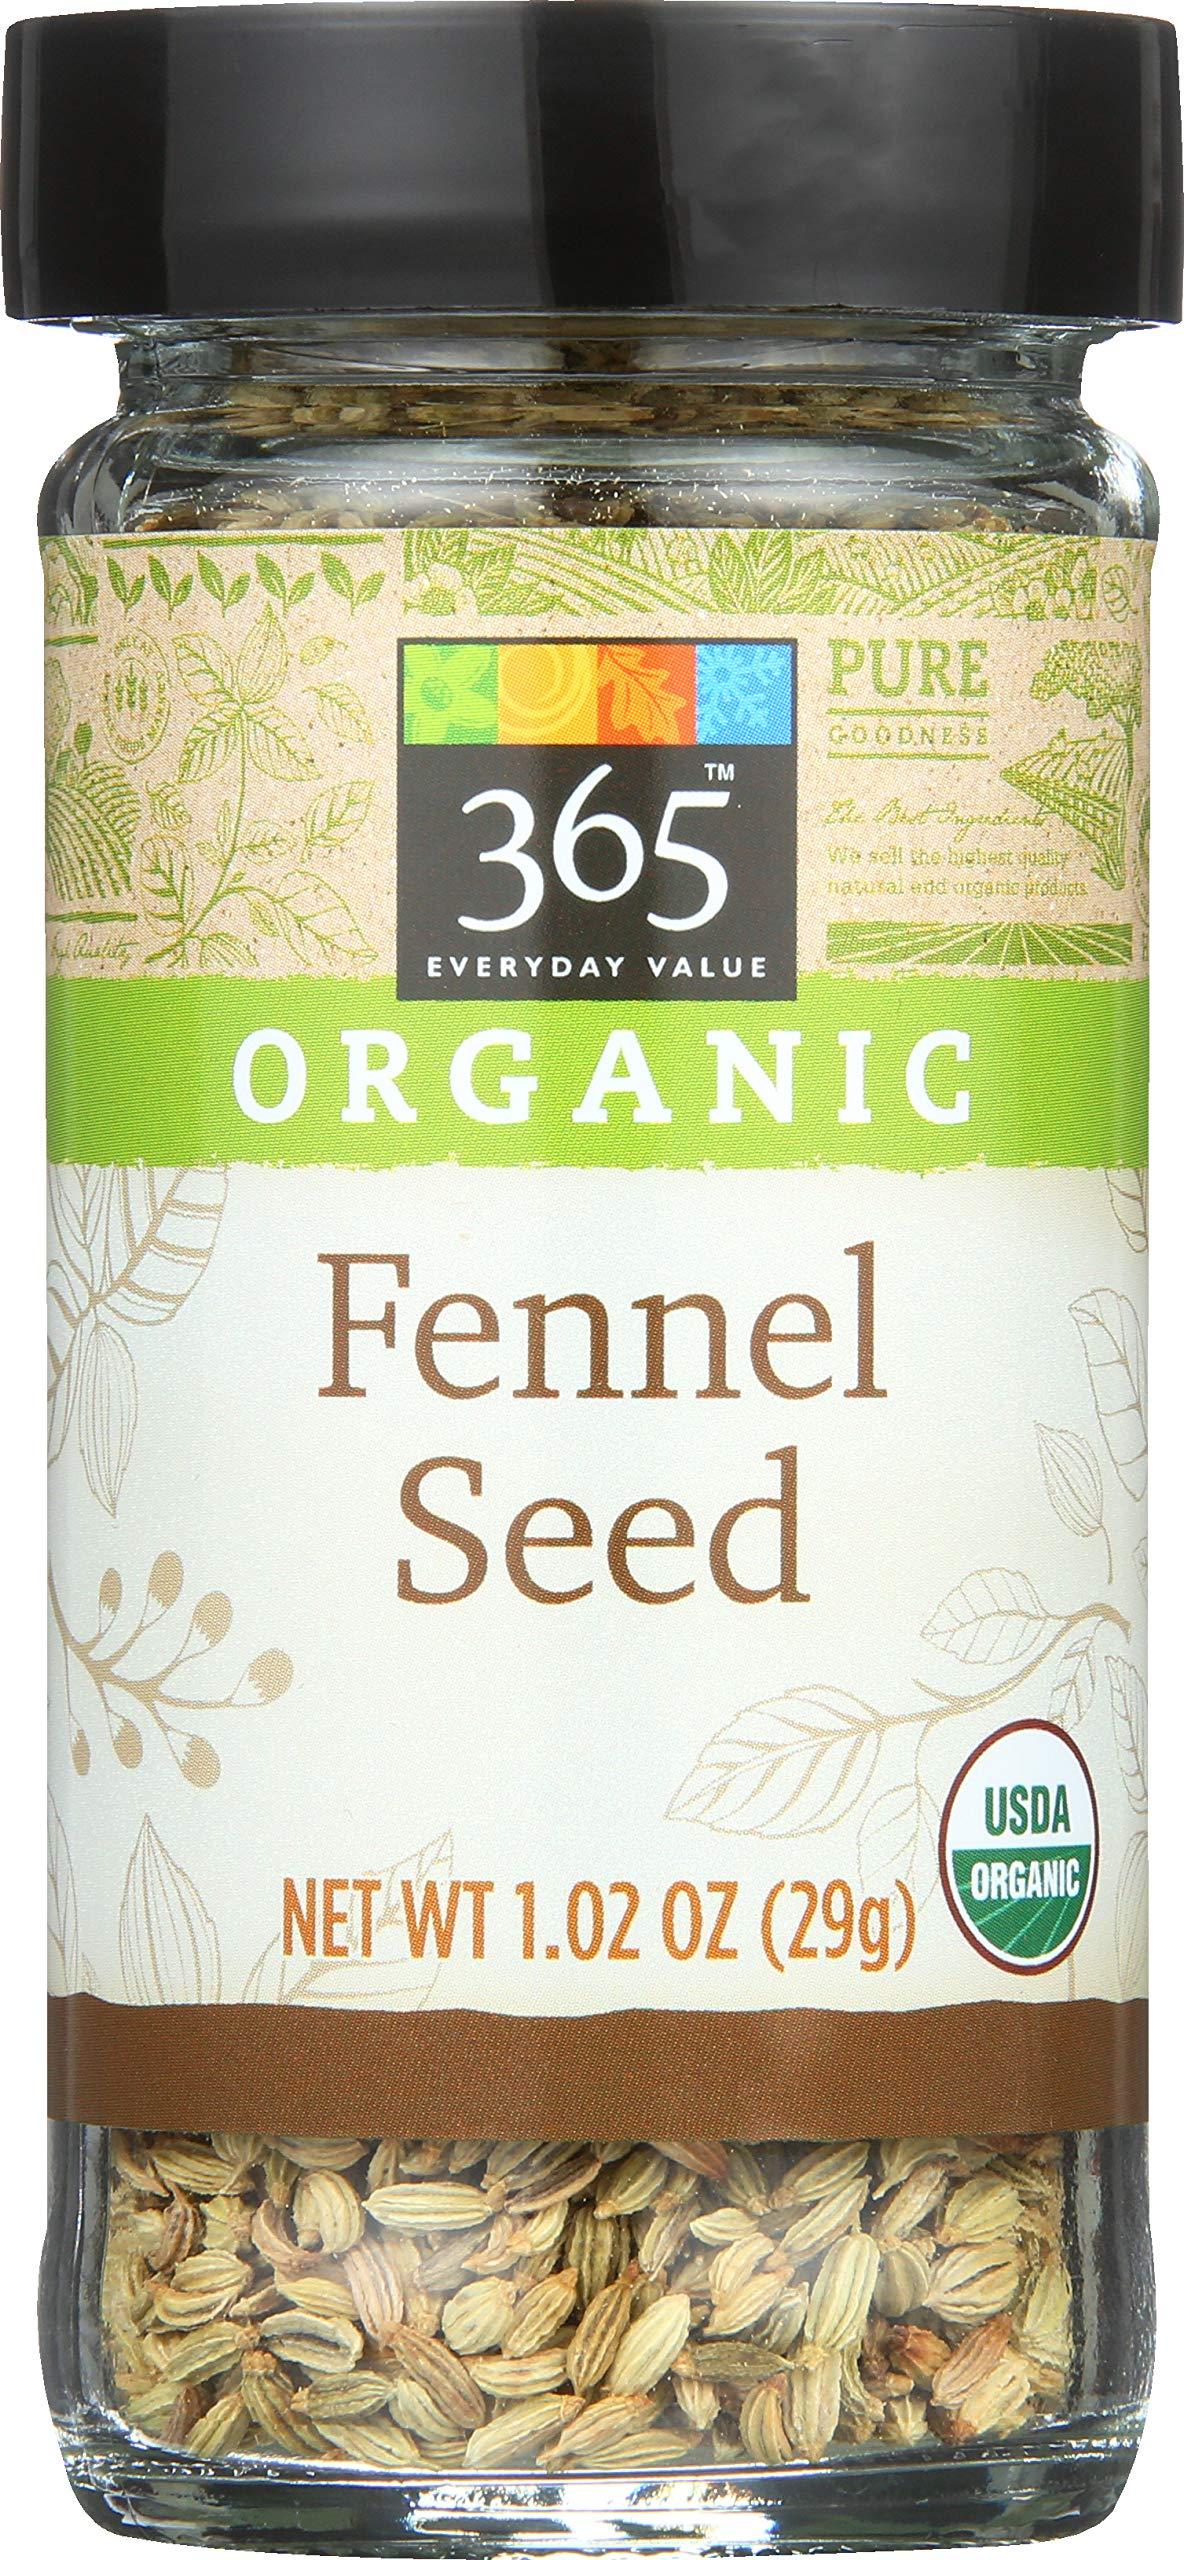 365 Everyday Value, Organic Fennel Seed, 1.02 oz